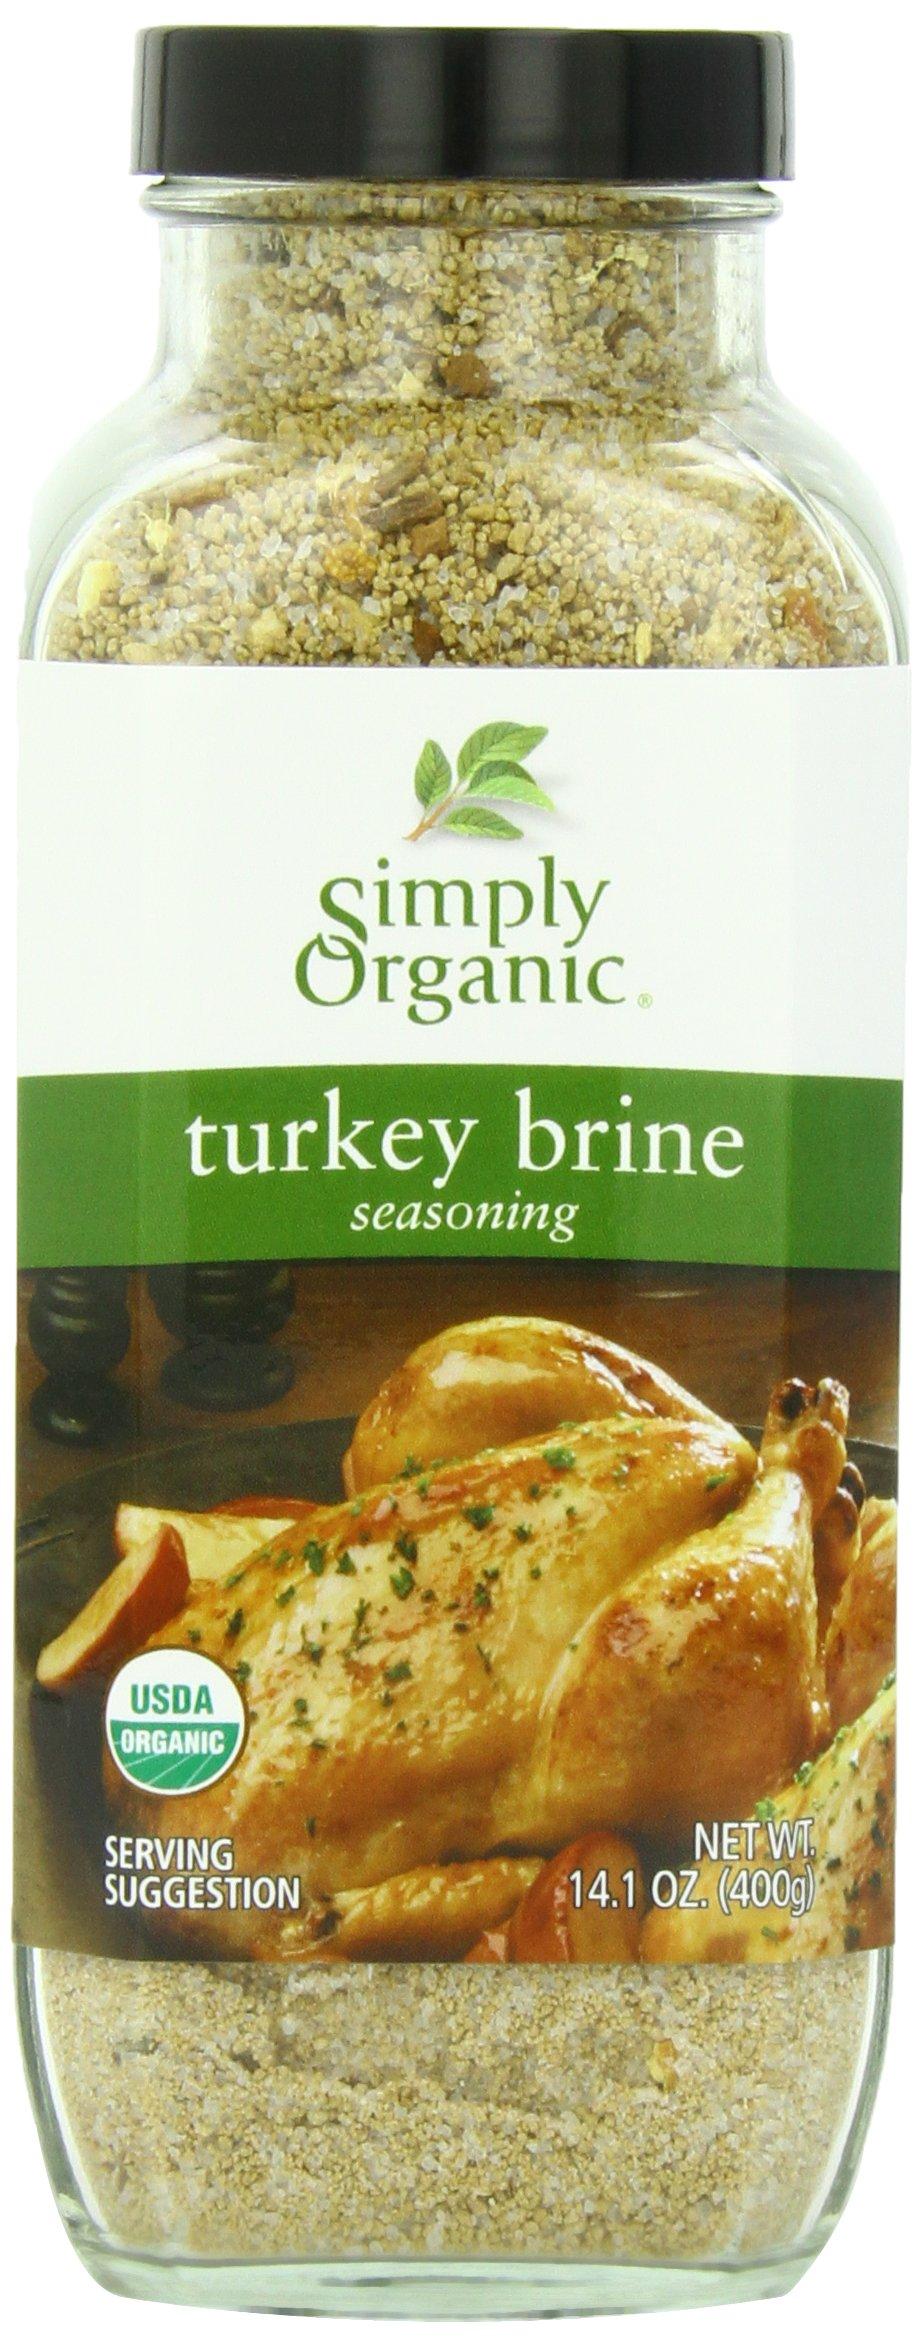 Simply Organic Seasoning Mix, Turkey Brine, 14.1 Ounce (Pack of 6)